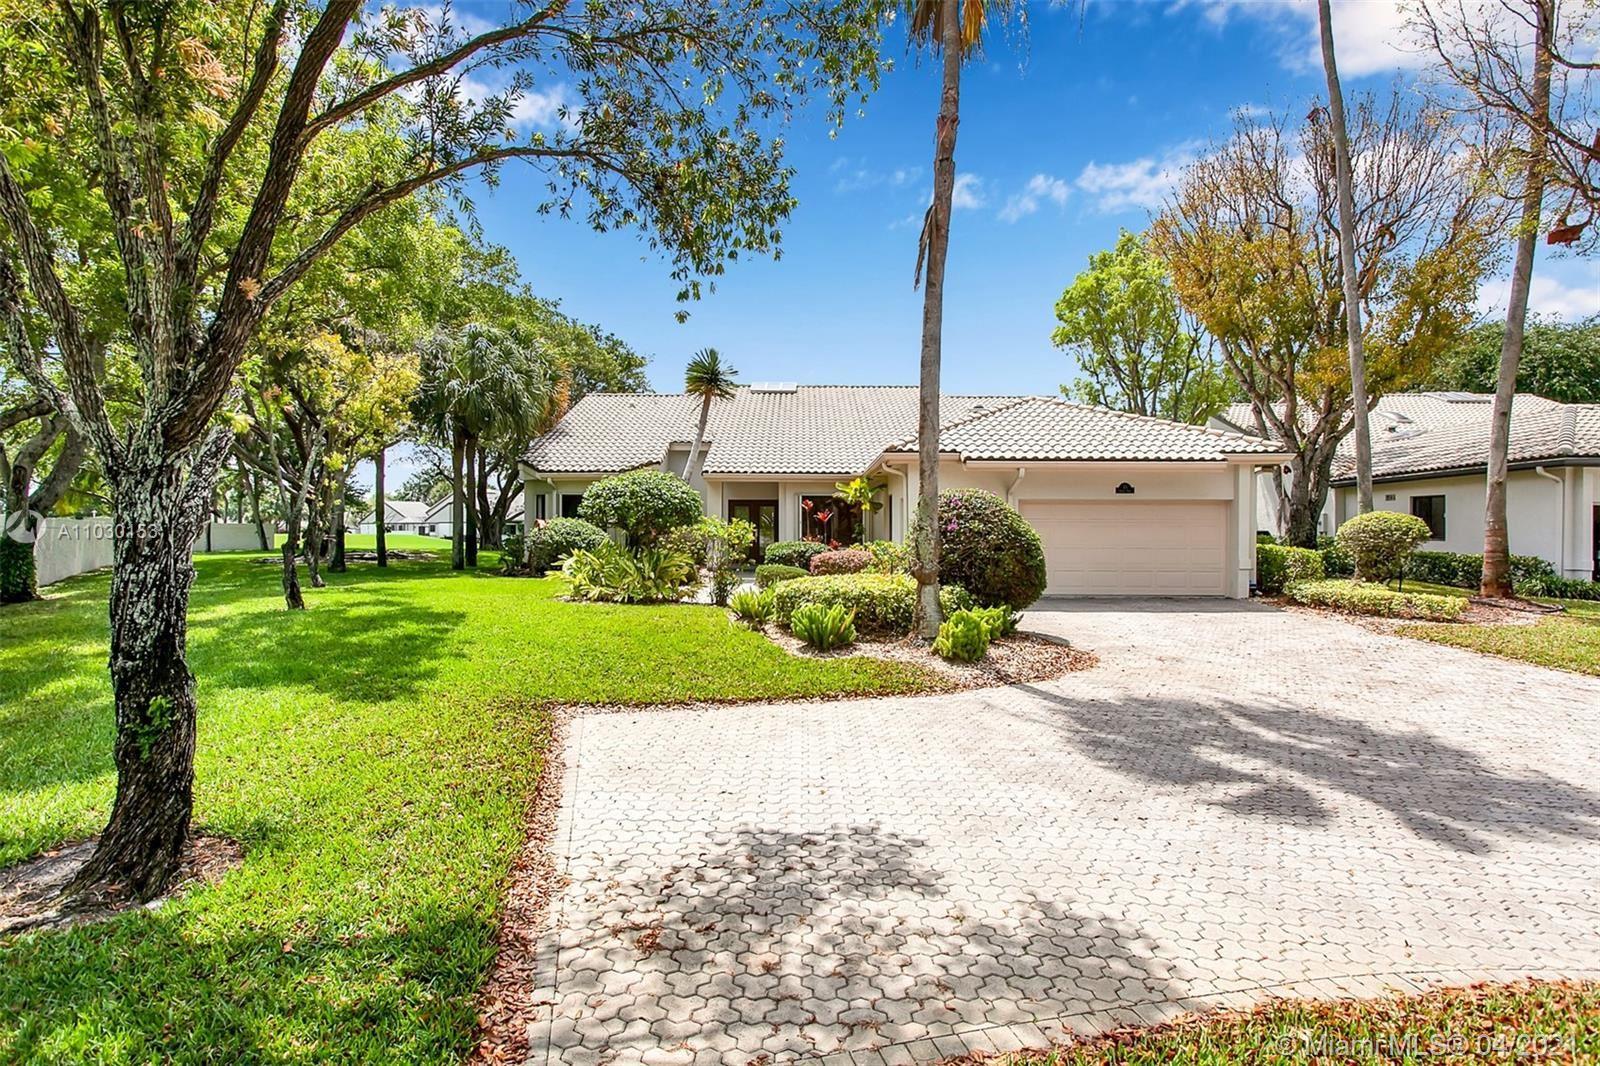 71 Bristol Dr, Boynton Beach, FL 33436 - #: A11030153